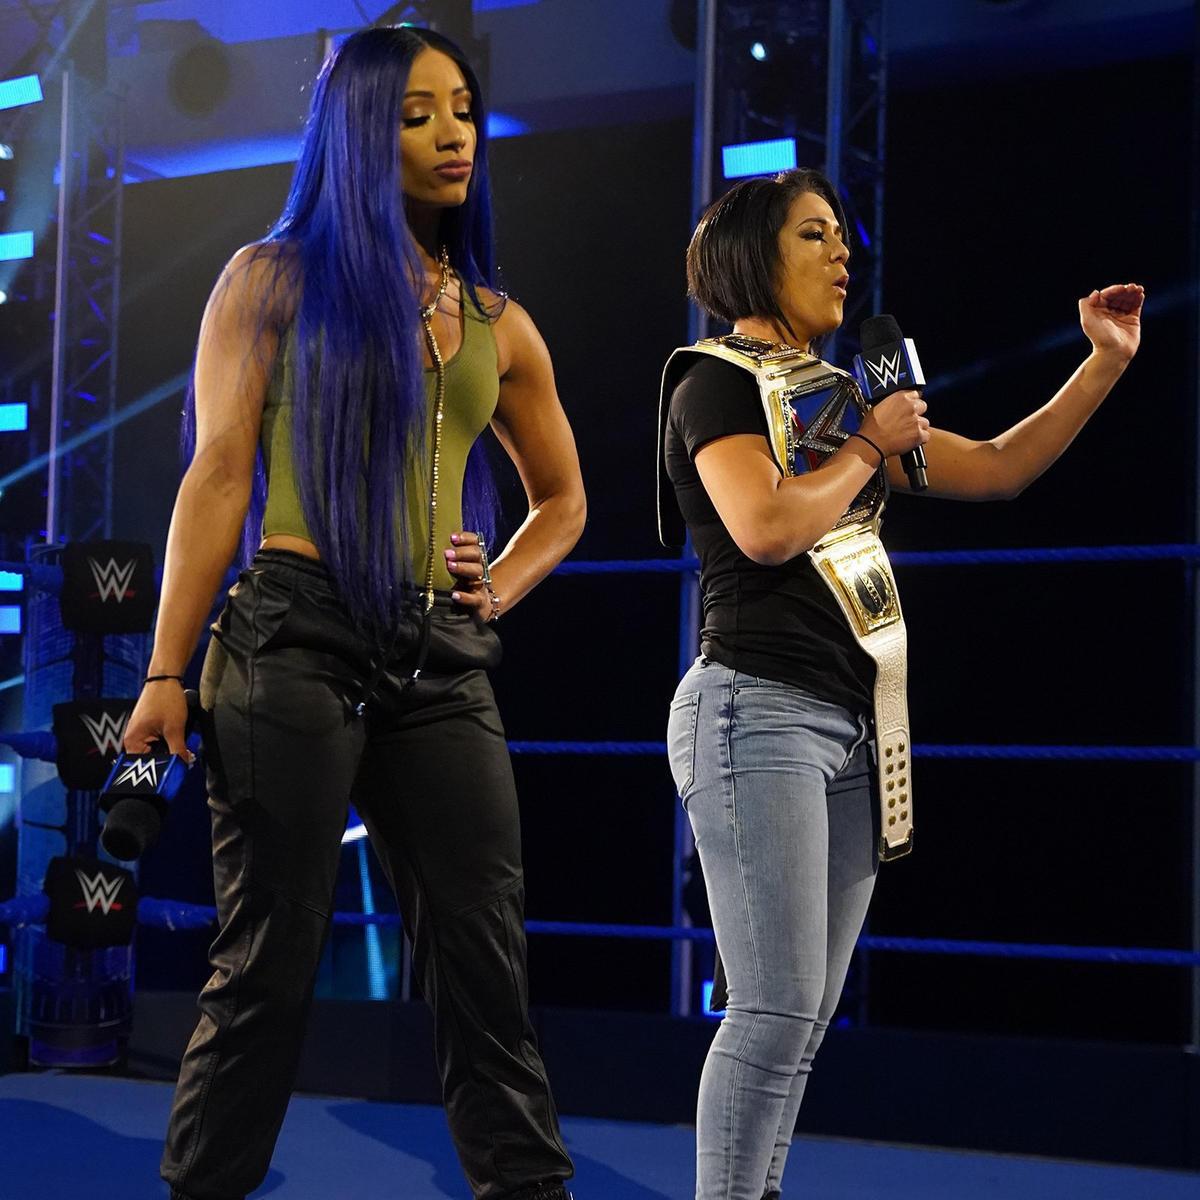 WWE Smackdown Results (10/04/20): Braun Strowman; Wrestlemania Rematch 2